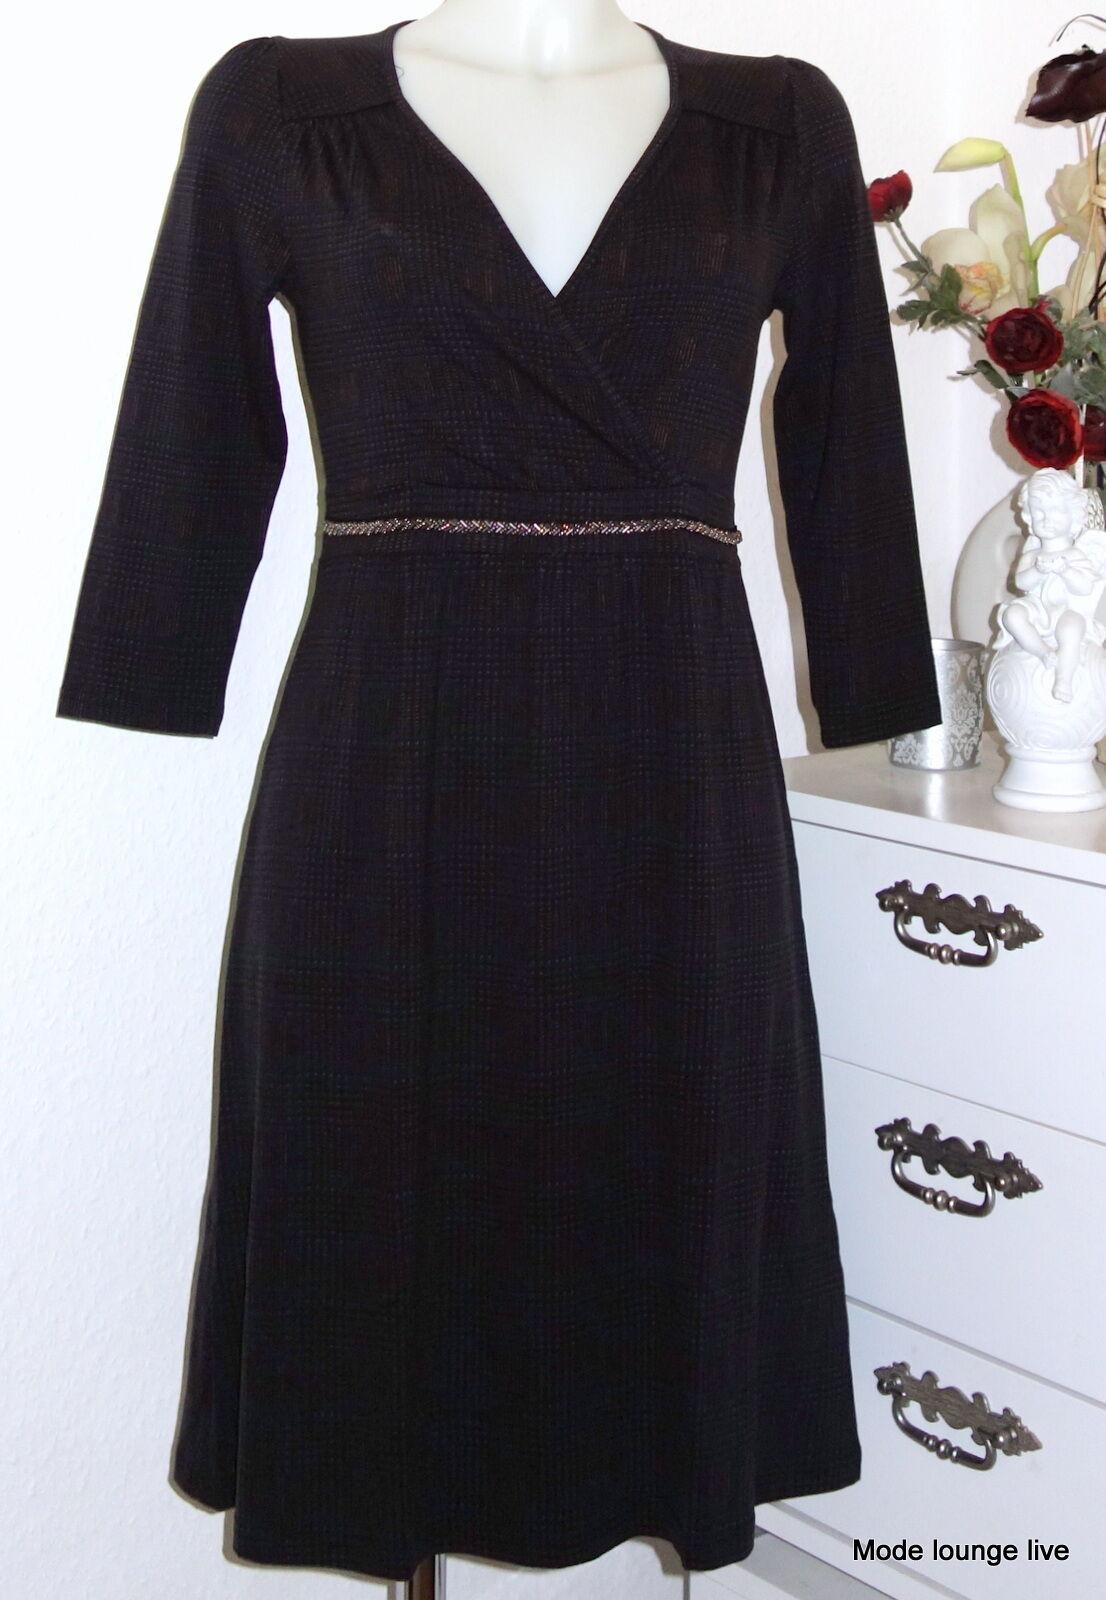 Vive Maria elegantes Kleid Downtown Girl Dress Glitzer Gürtel-Borte schwarz 317262